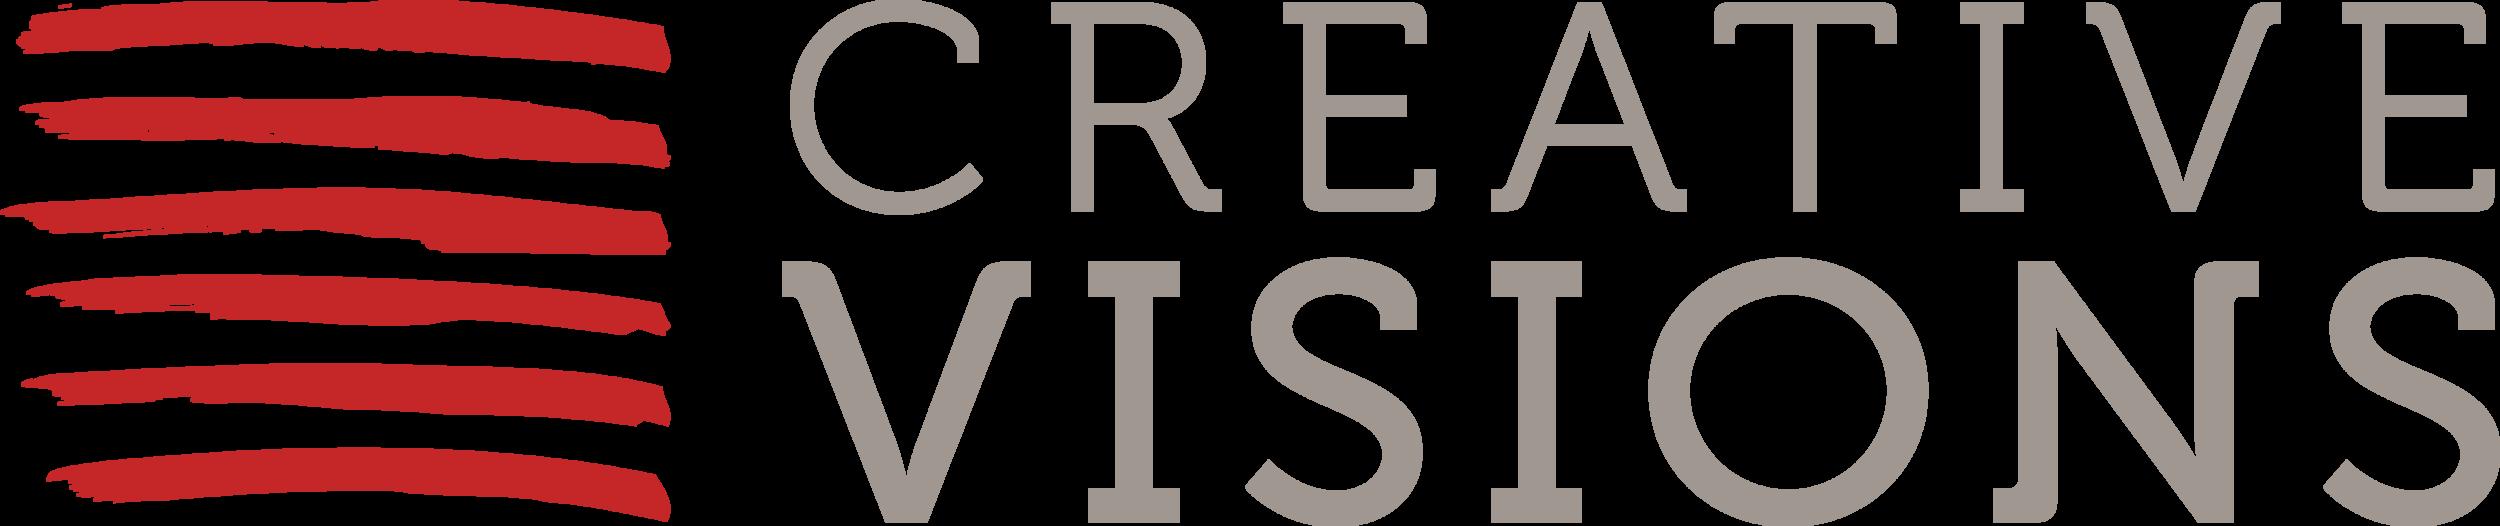 creativevisions